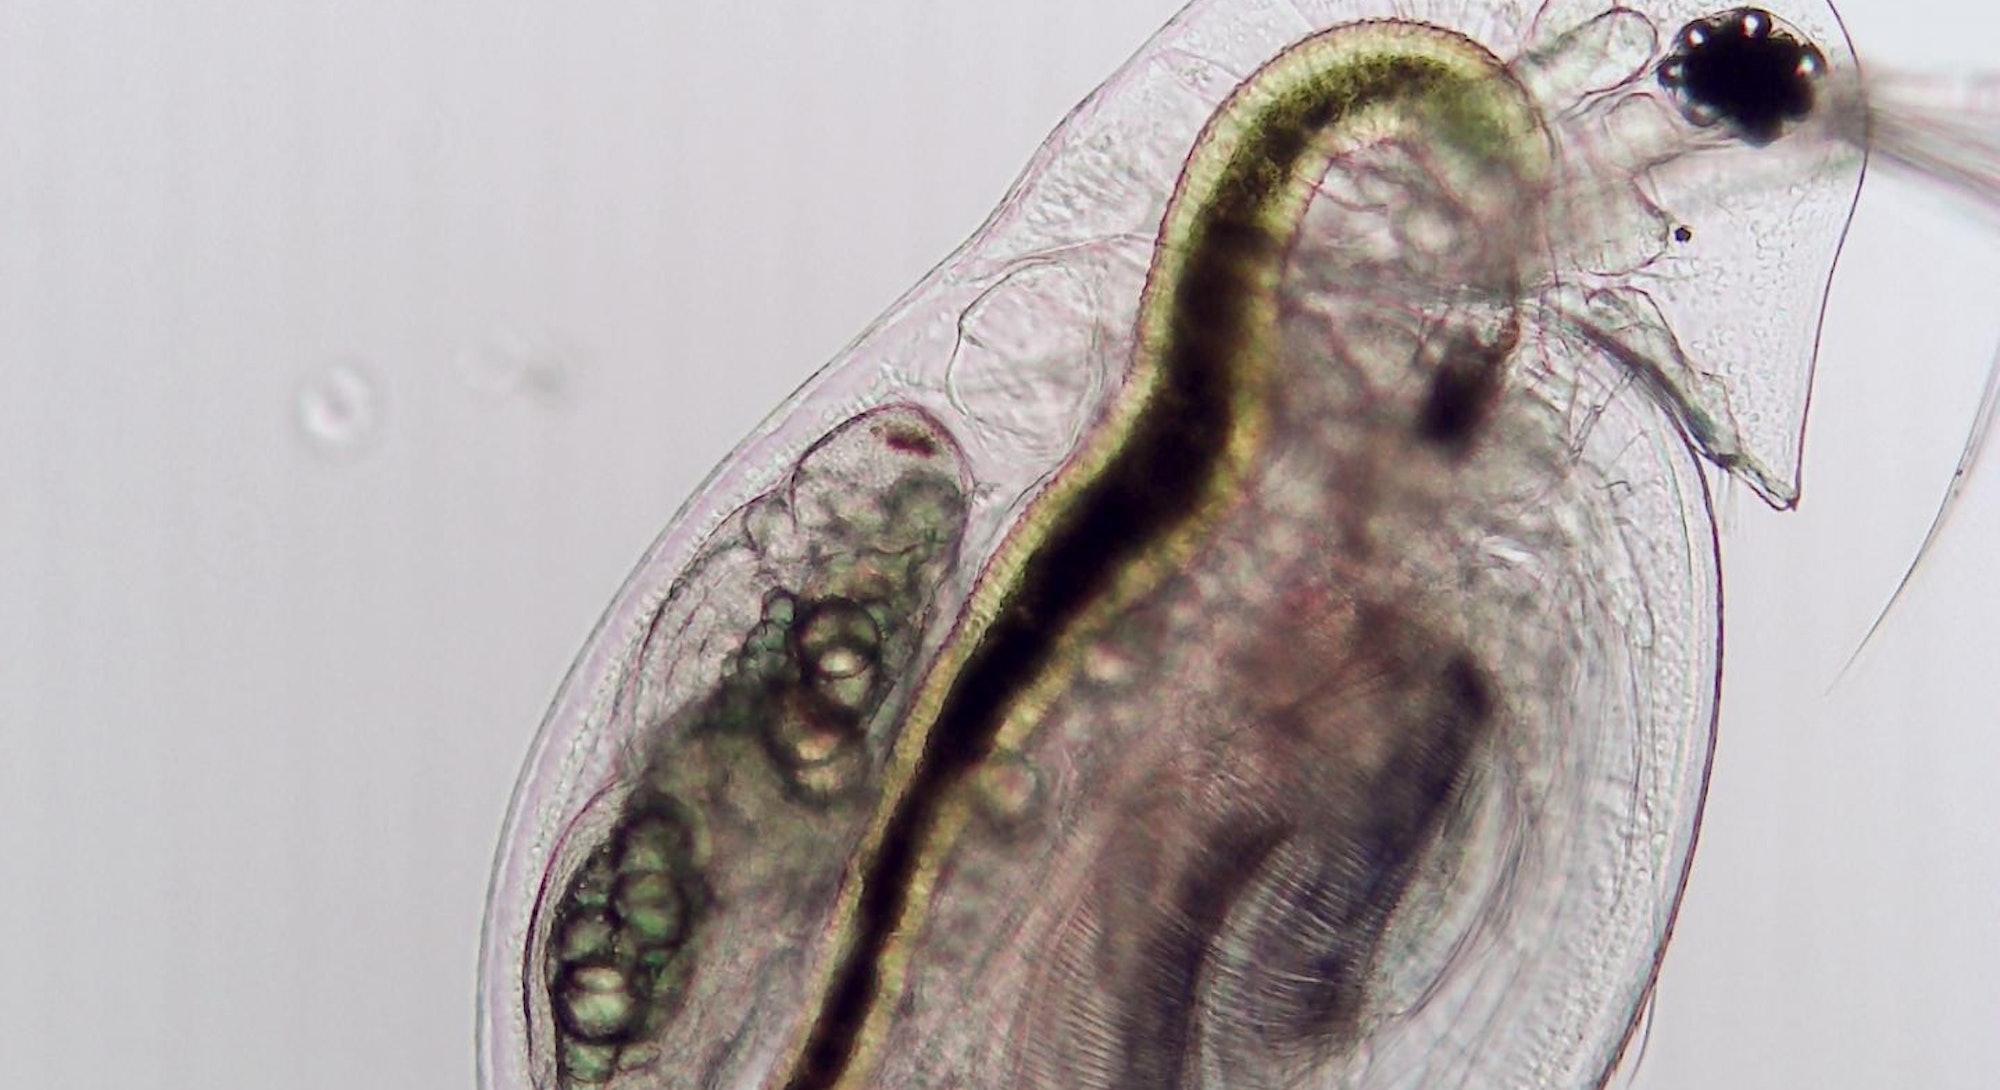 A zooplankton (Daphnia dentifera) not infected by fungal parasite Metschnikowia bicuspidate.